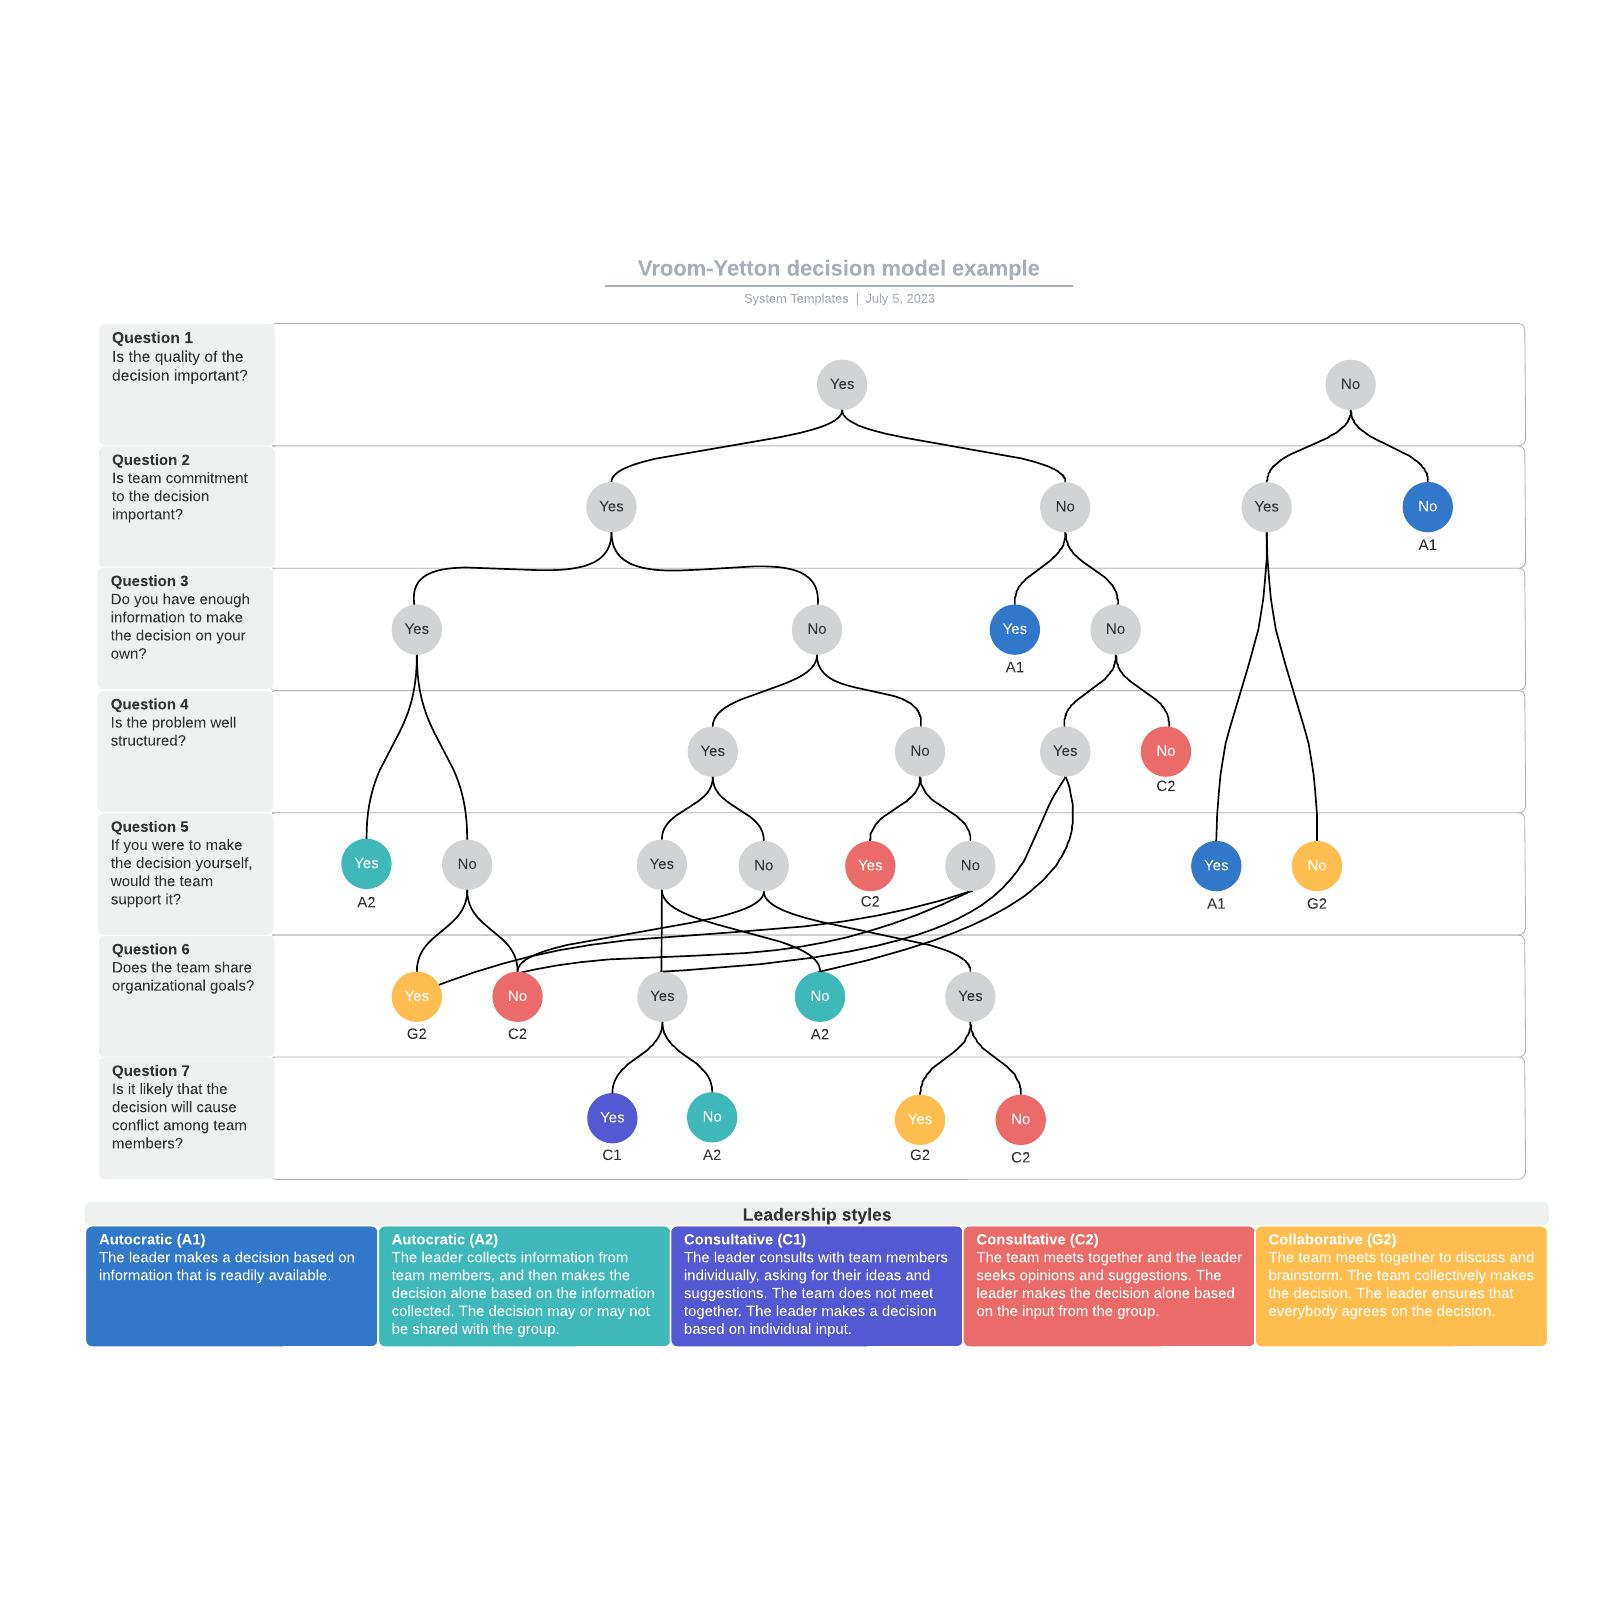 Vroom-Yetton decision model example